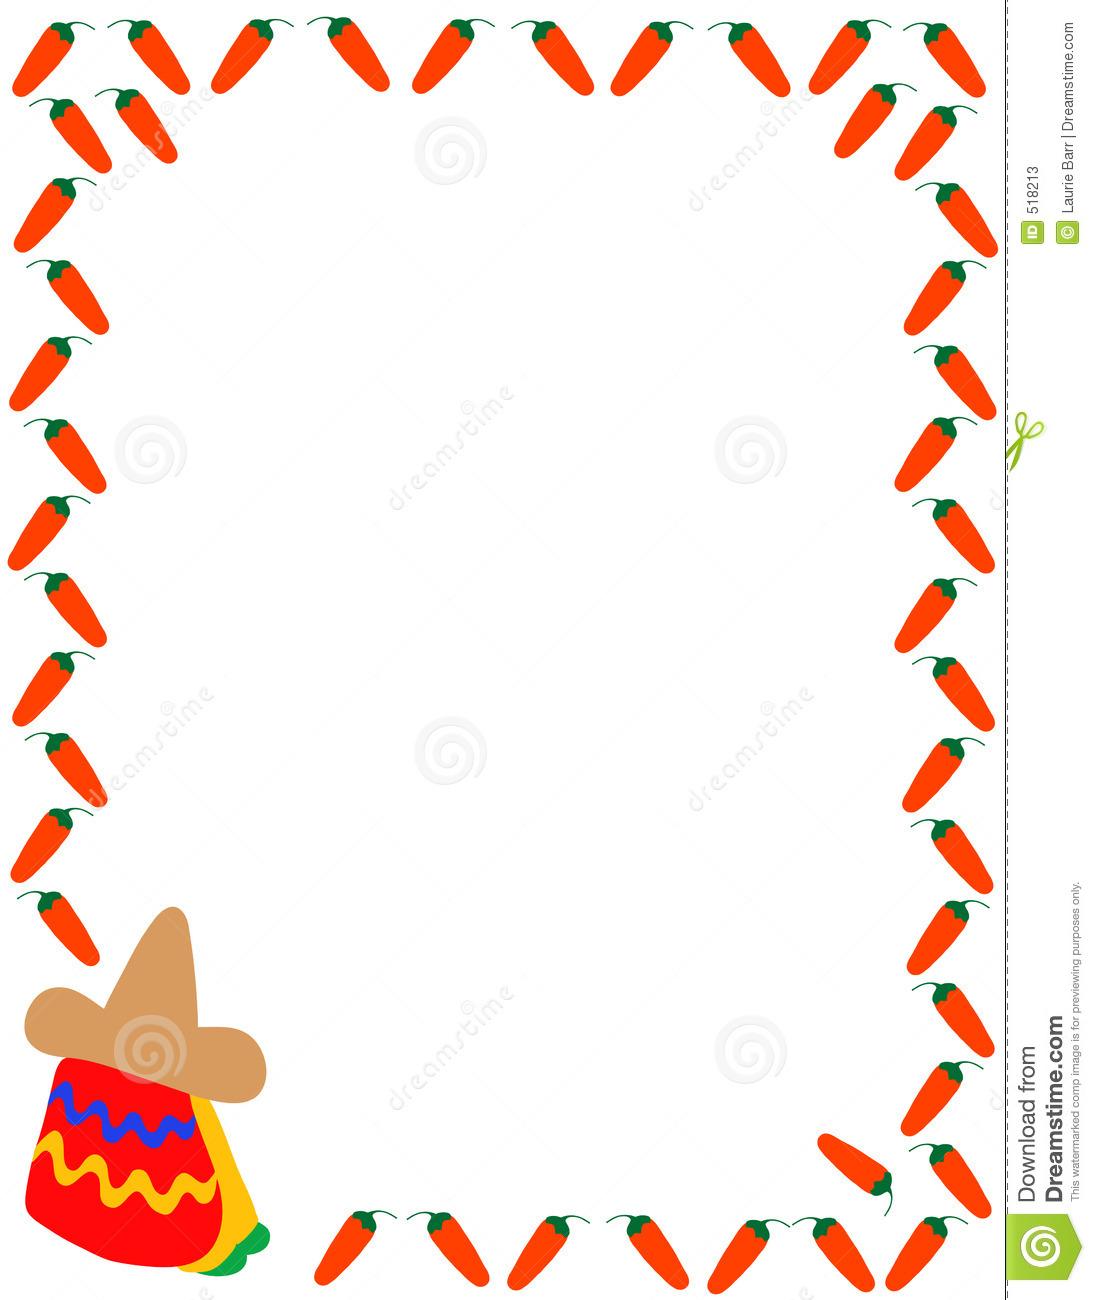 1095x1300 Mexican Border Clipart